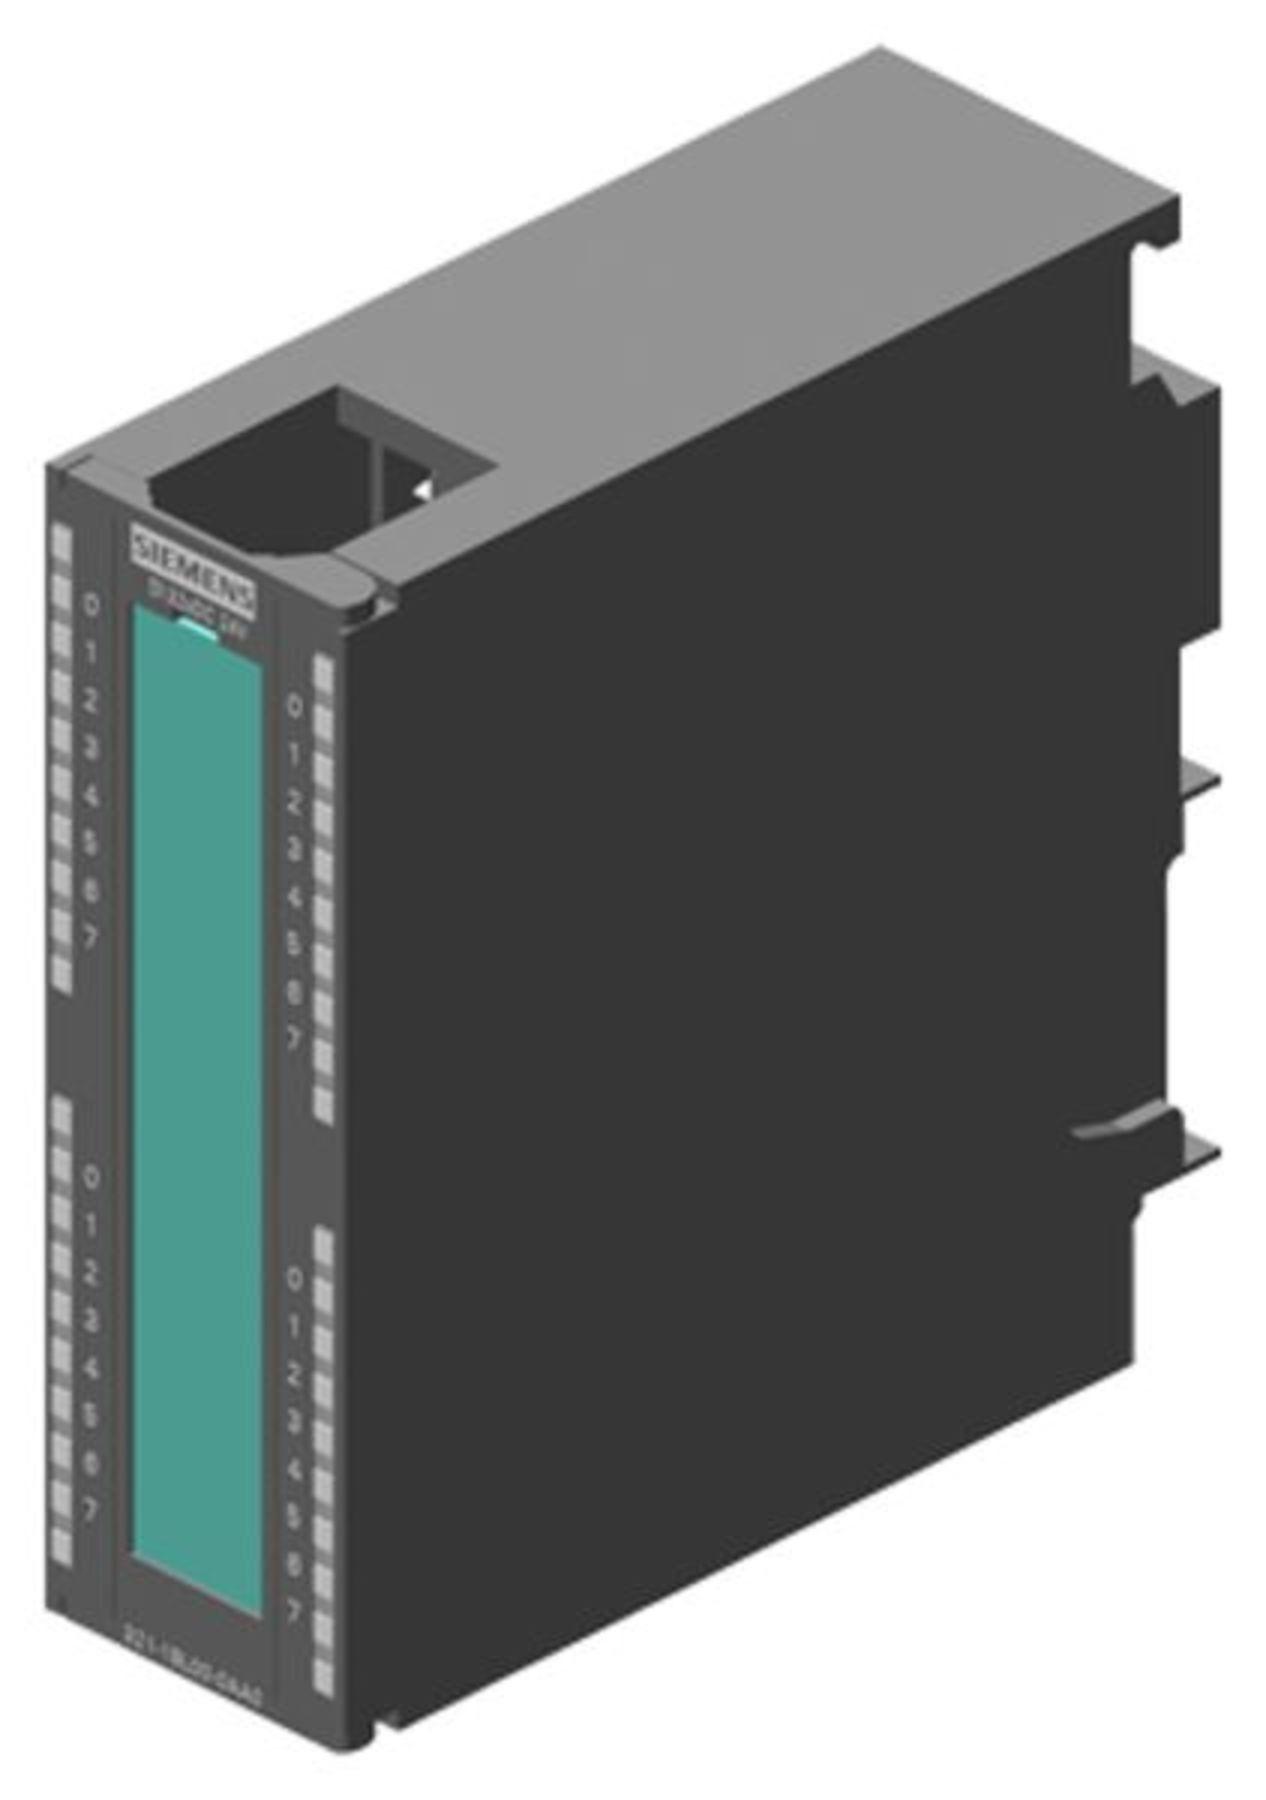 Siemens 6ES7 321-1BL00-0AA0 Simatic S7 PLC Module 6ES7321-1BL00-0AA0 *Working*